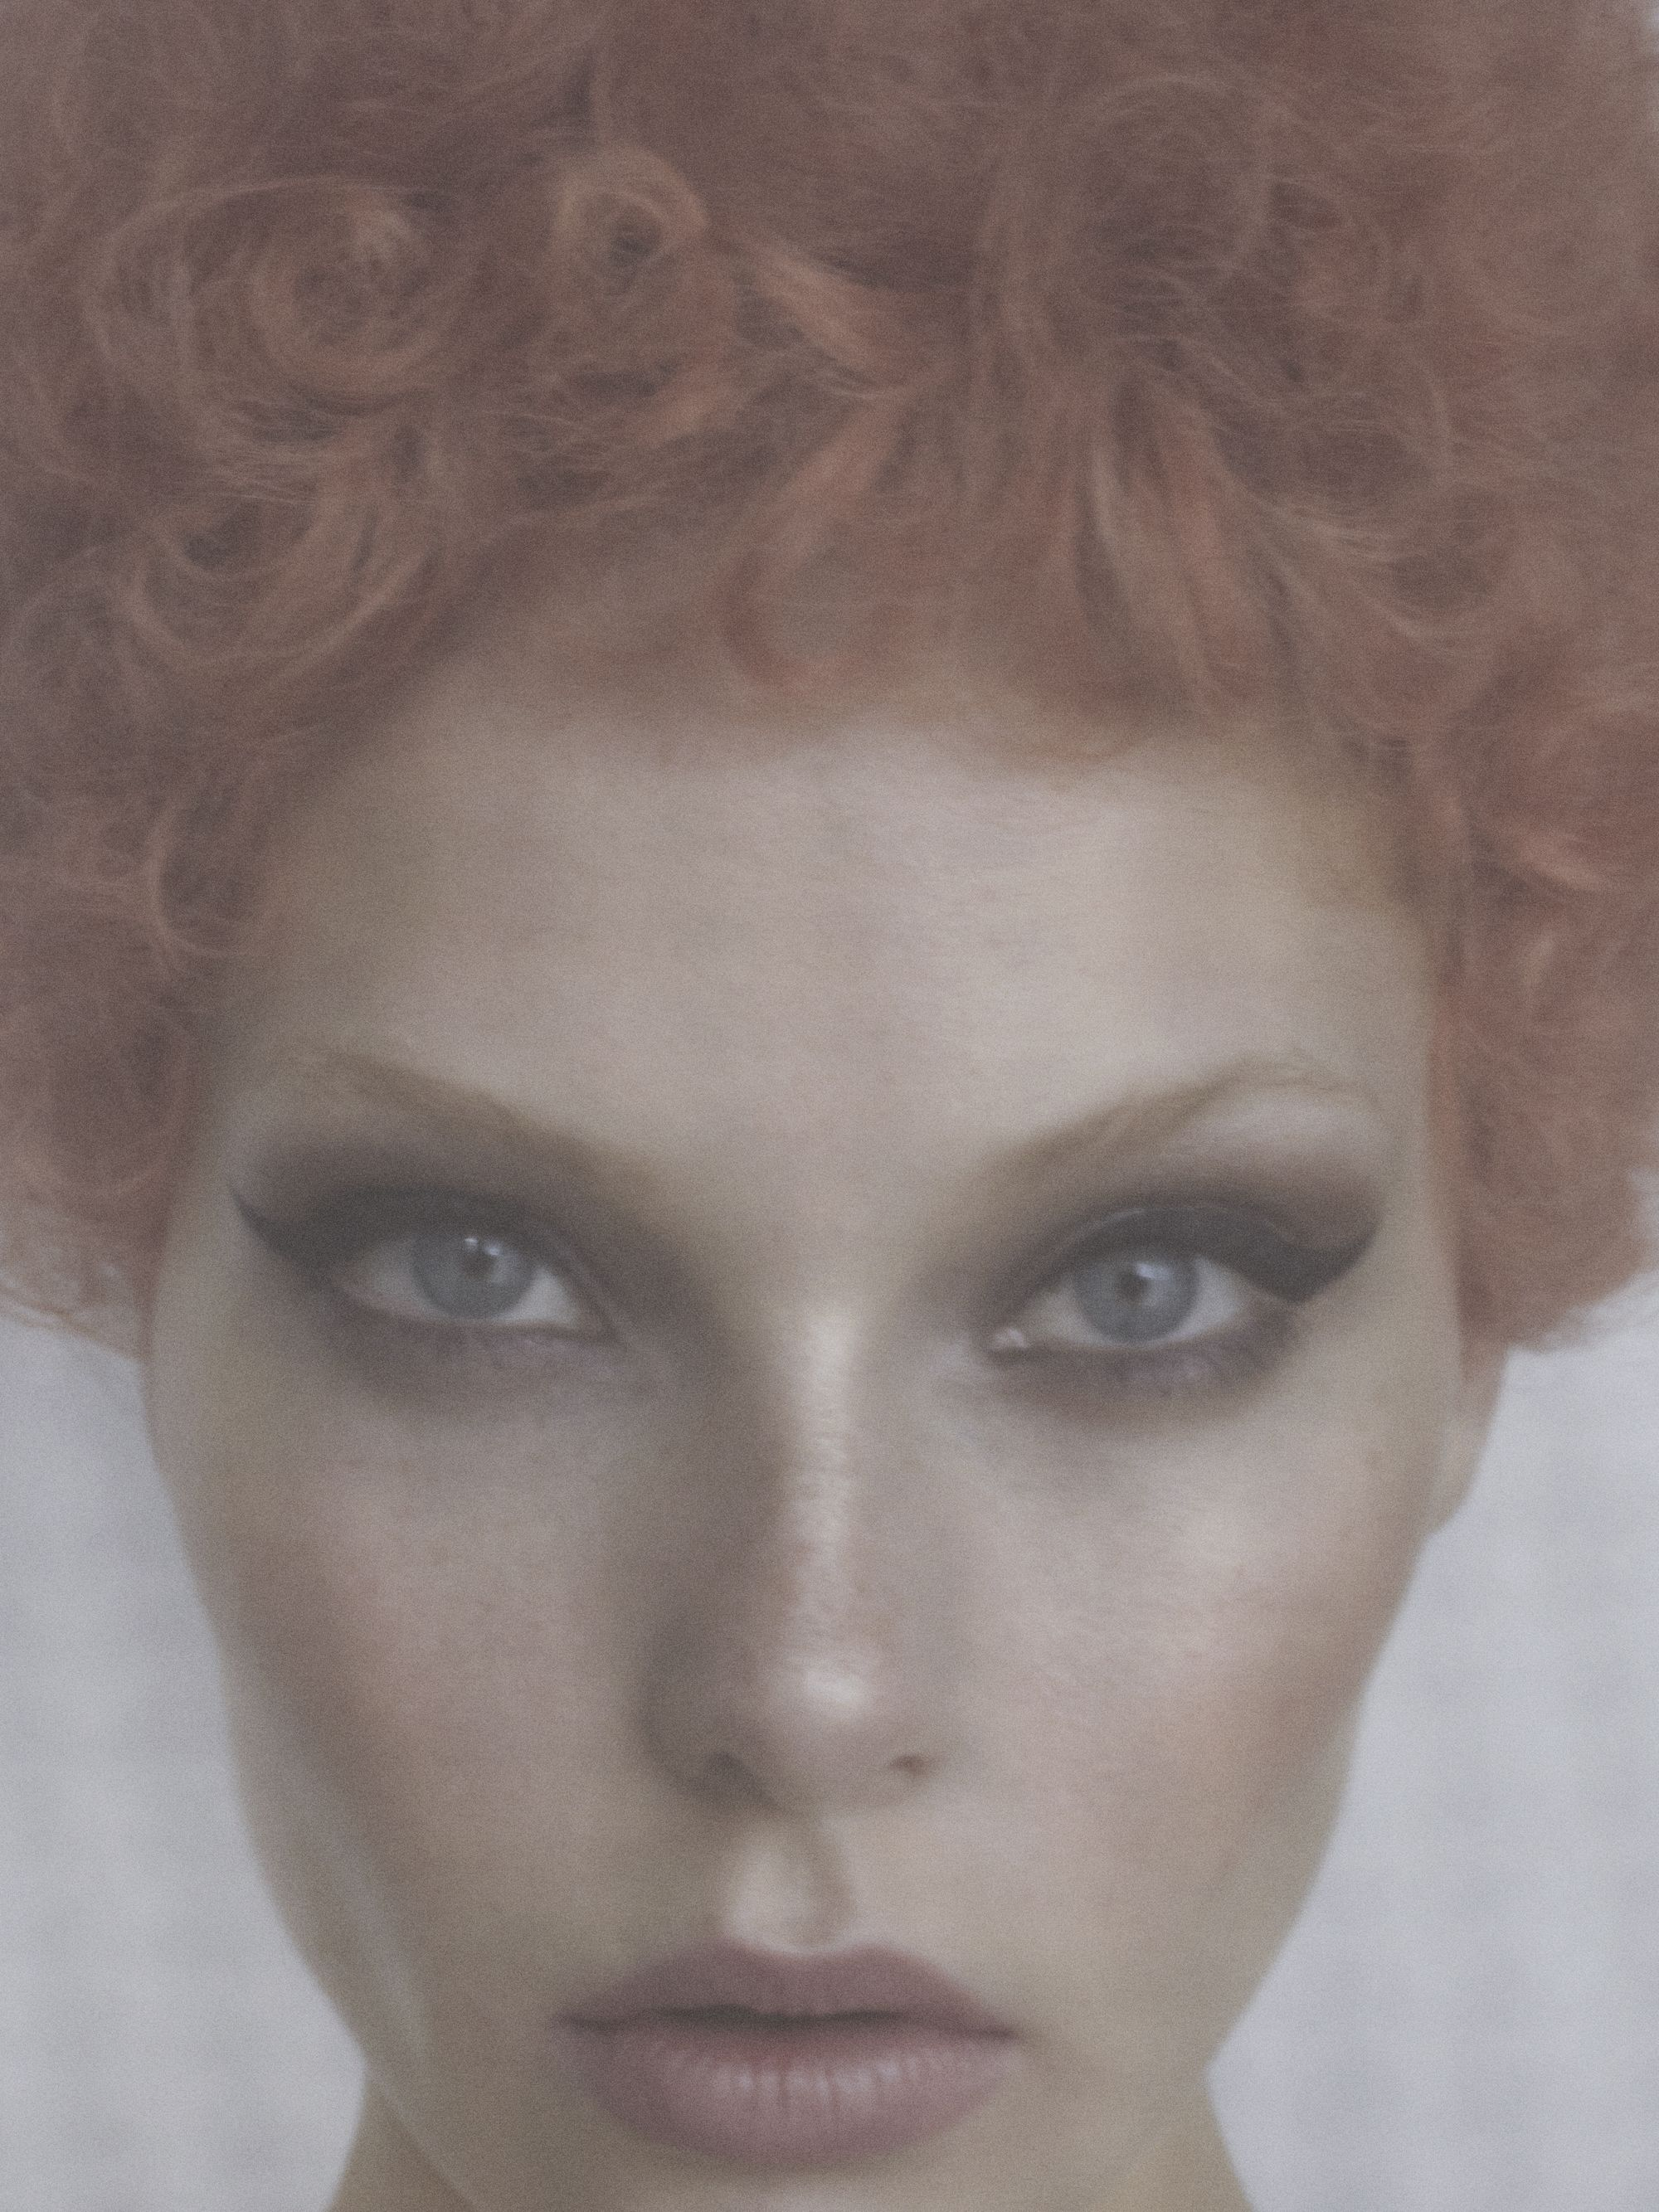 VERLOCKEND - Tush Online  Foto: Jesse Laitinen / Minkmgmt Hair: Dejan Cekanovic / Hall&Lundgren Make-up: Sophia Eriksen / Hall&Lundgren